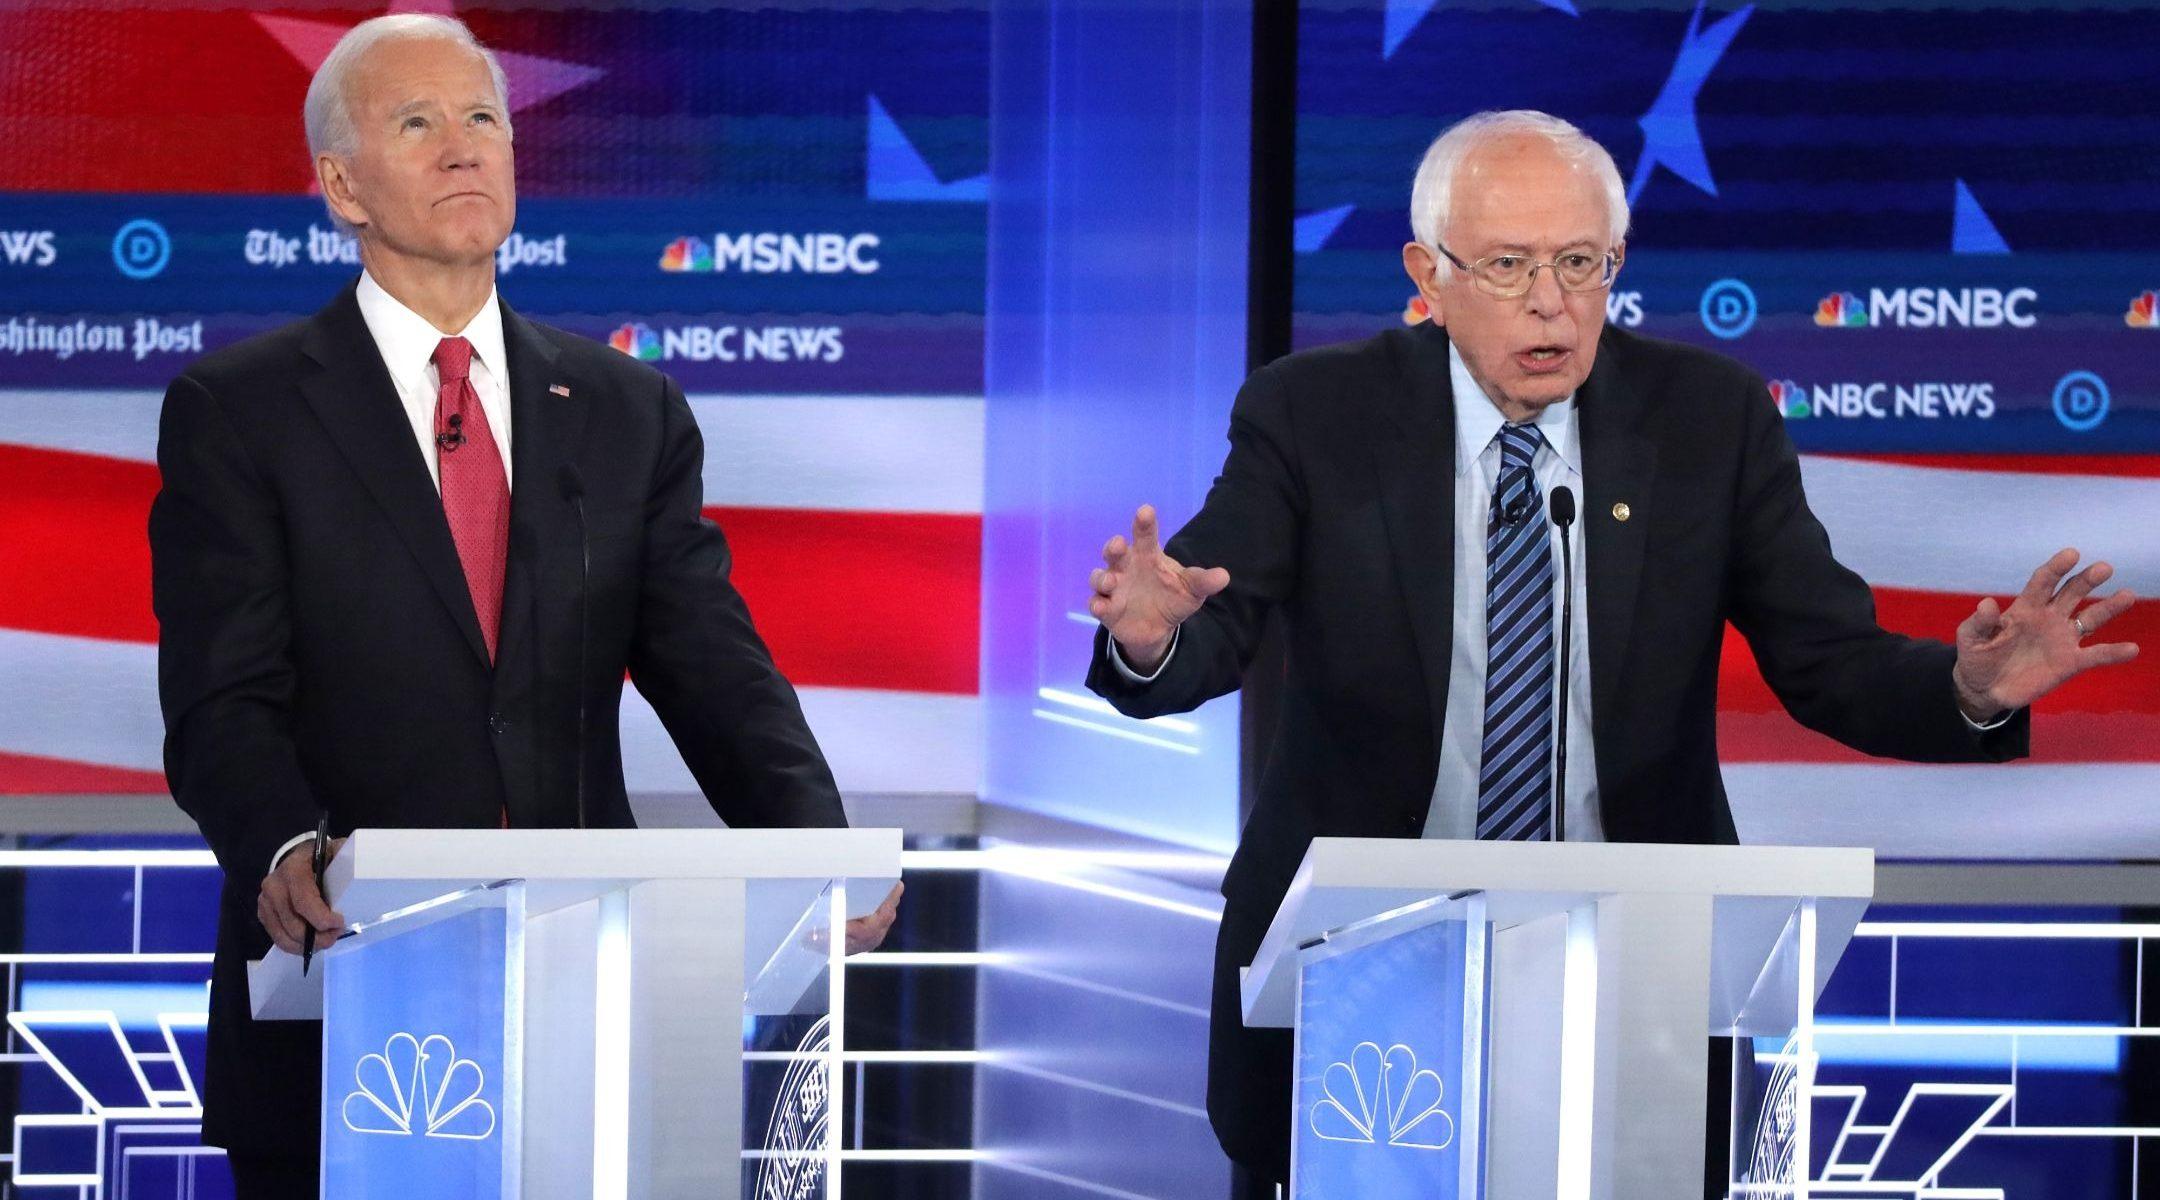 Joe Biden, left, listens as Sen. Bernie Sanders makes a point during the Democratic presidential debate in Atlanta, Nov. 20, 2019. (JTA/Alex Wong/Getty Images)